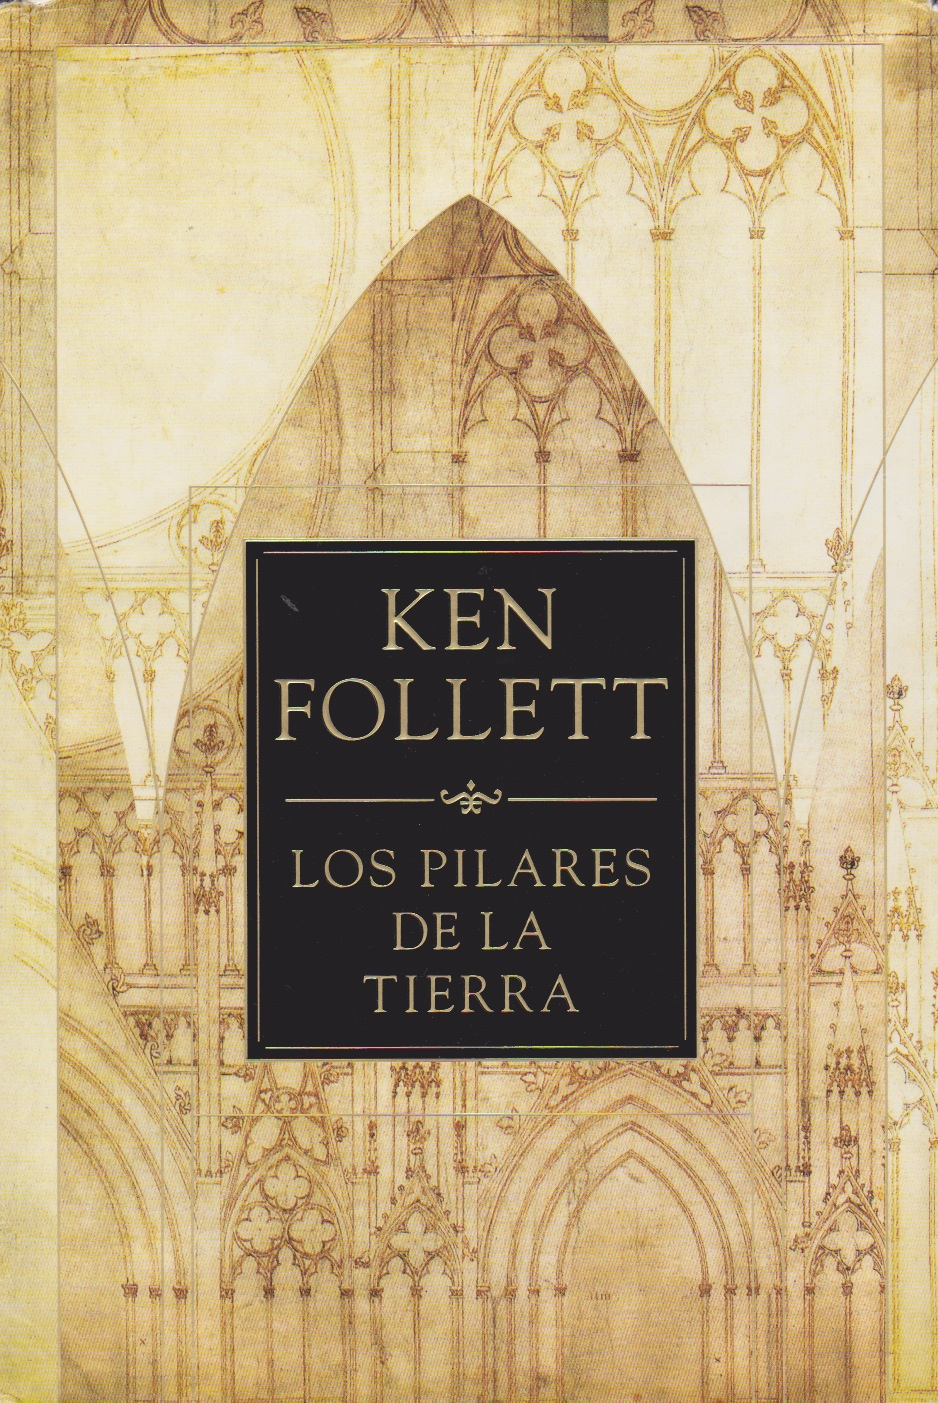 libreria sempere e hijos barcelona: misterio lagunadelibros ... - Libreria Sempere E Hijos Barcelona